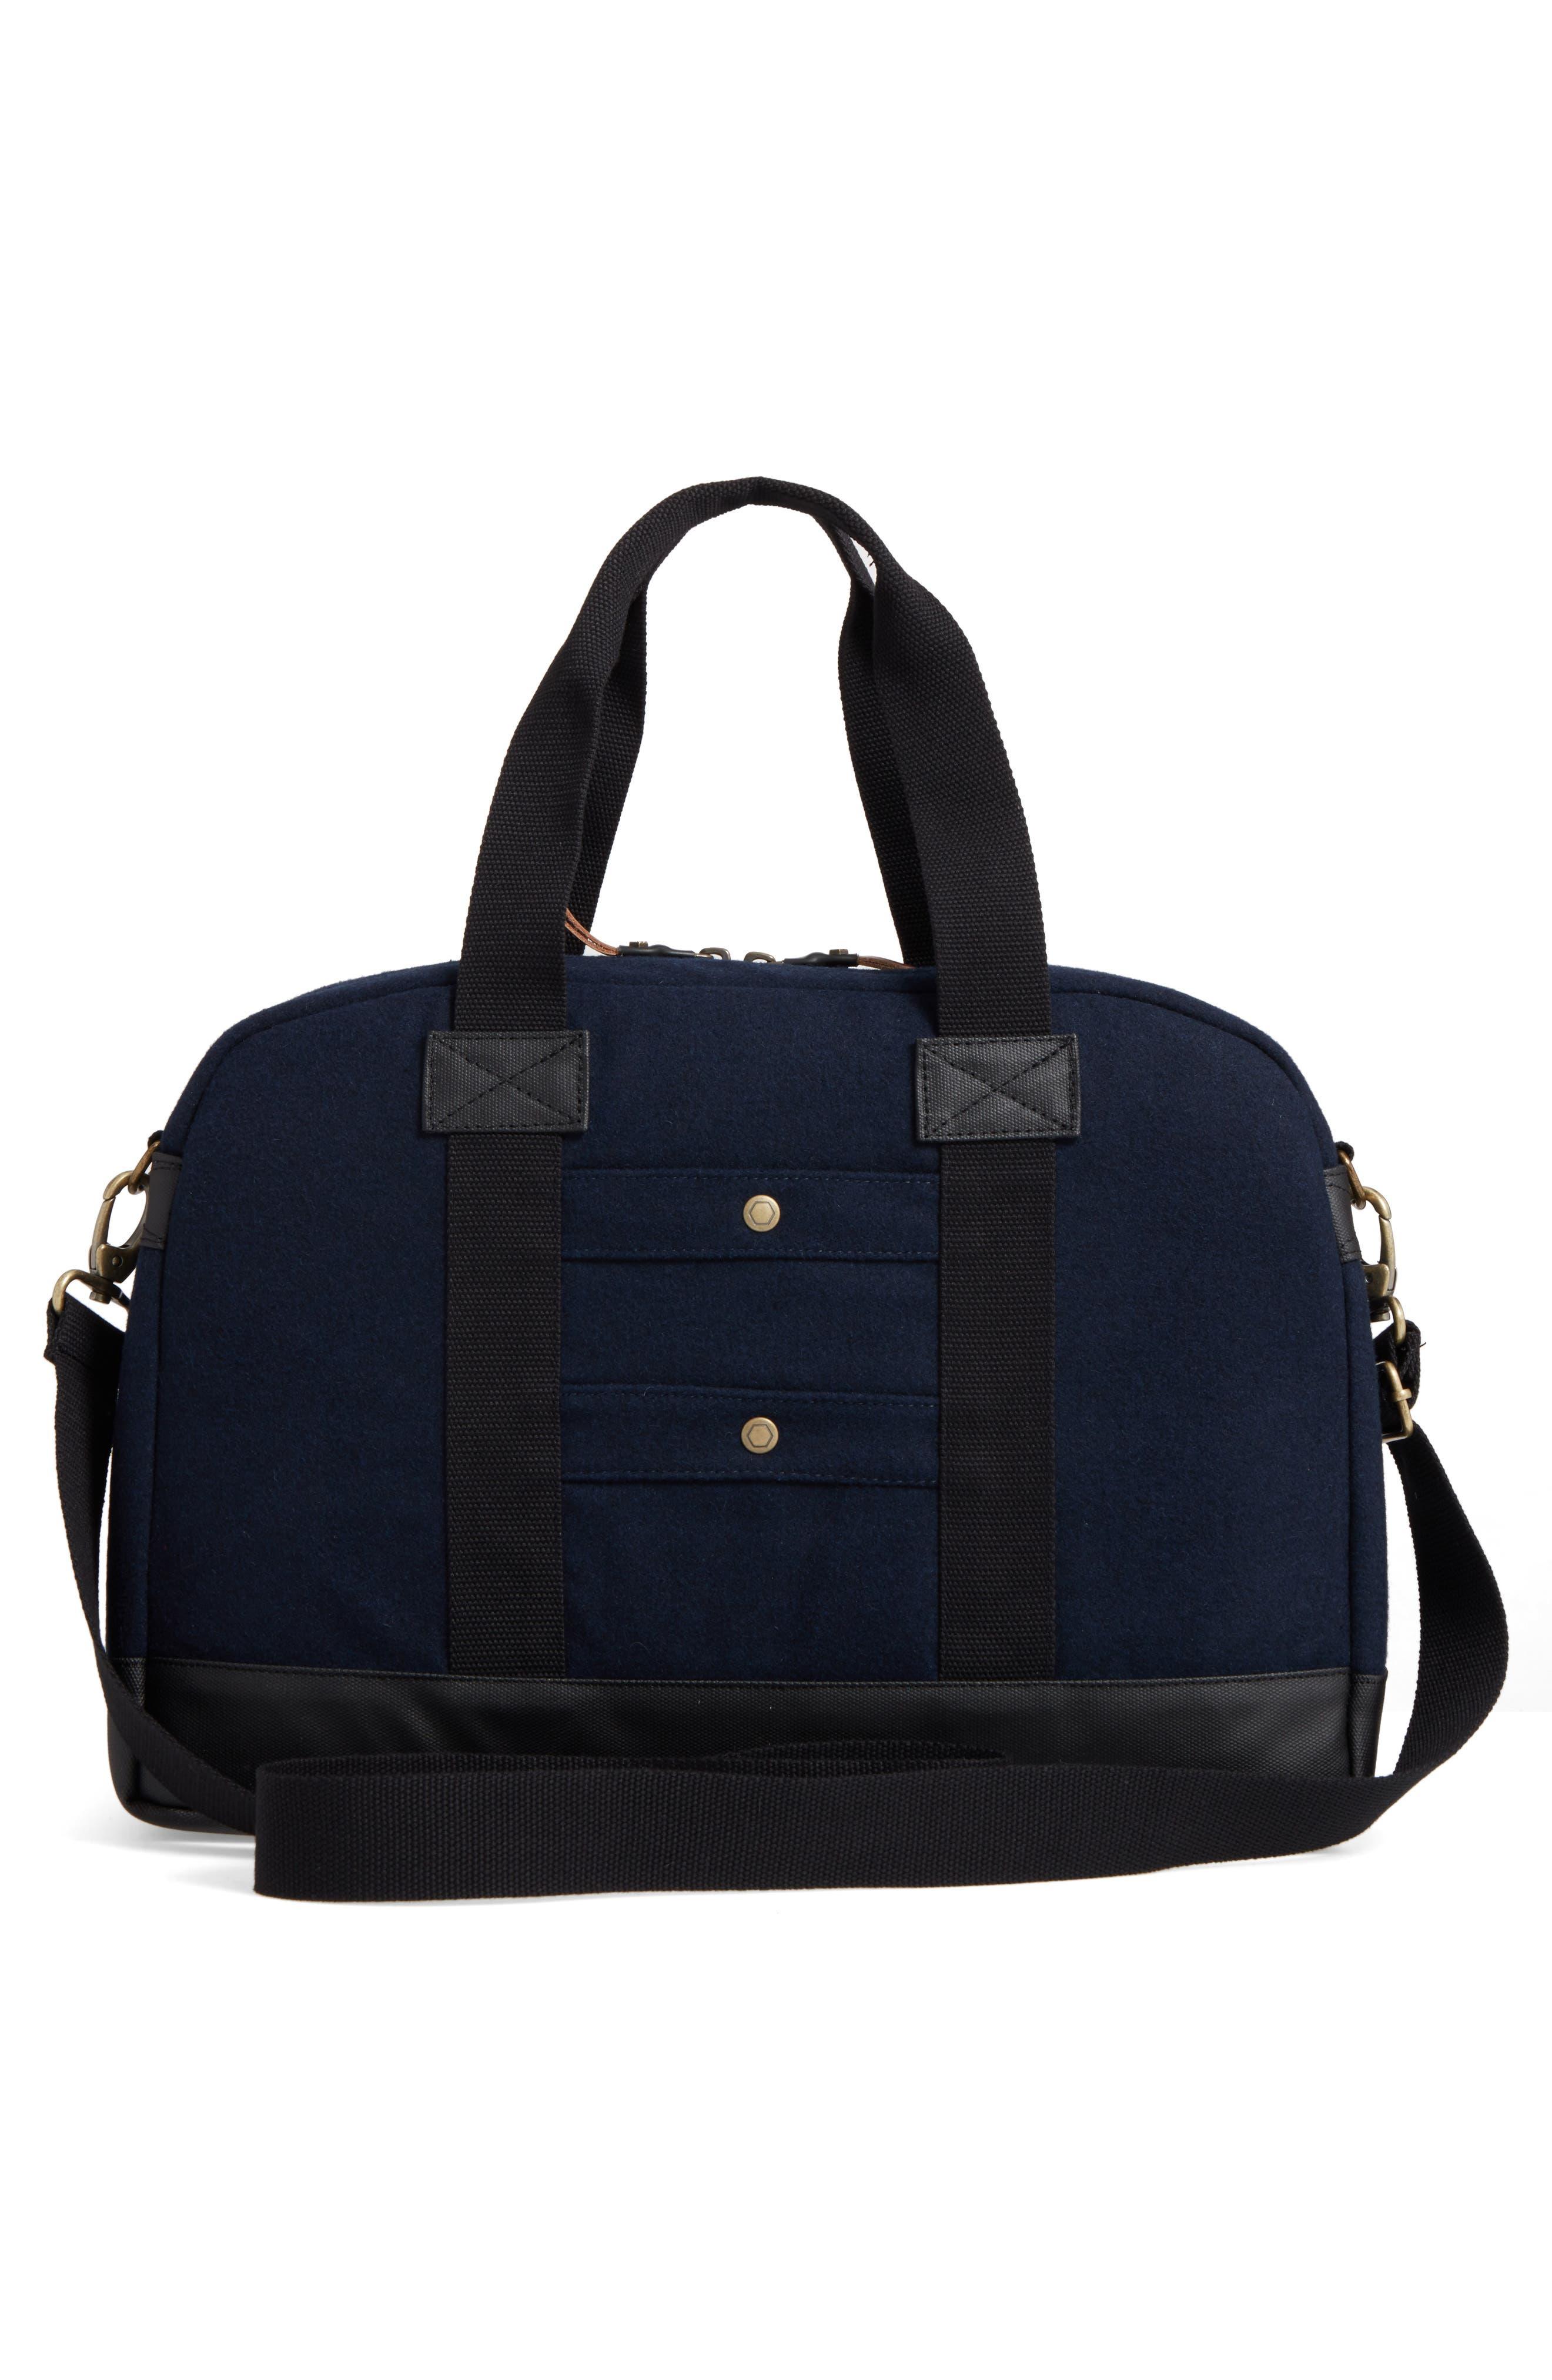 Laptop Duffel Bag,                             Alternate thumbnail 3, color,                             410